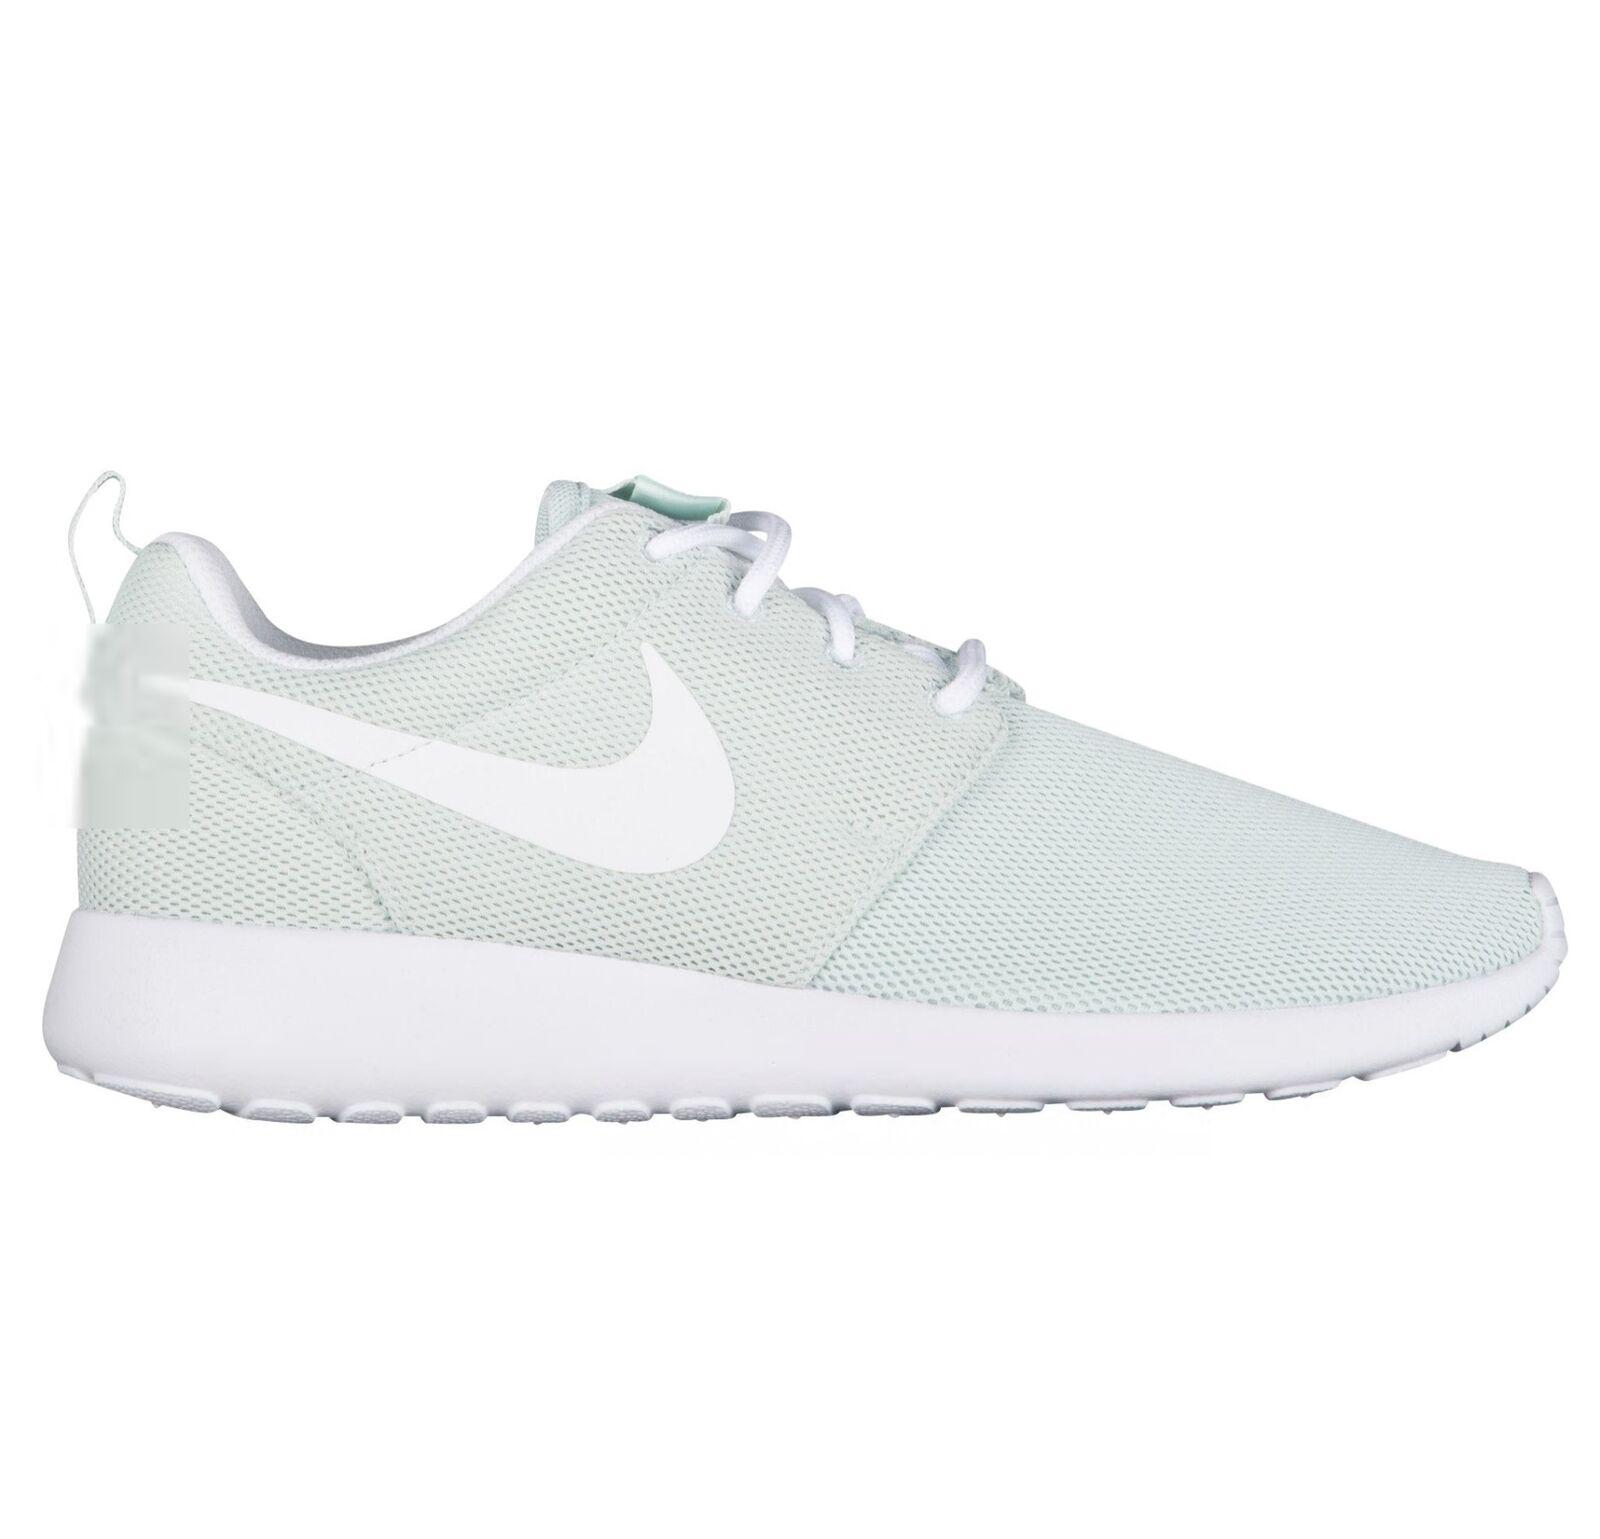 new concept 97241 a7b99 Nike Roshe One Womens 844994-303 Fiberglass White White White Mesh Running  shoes Size 11